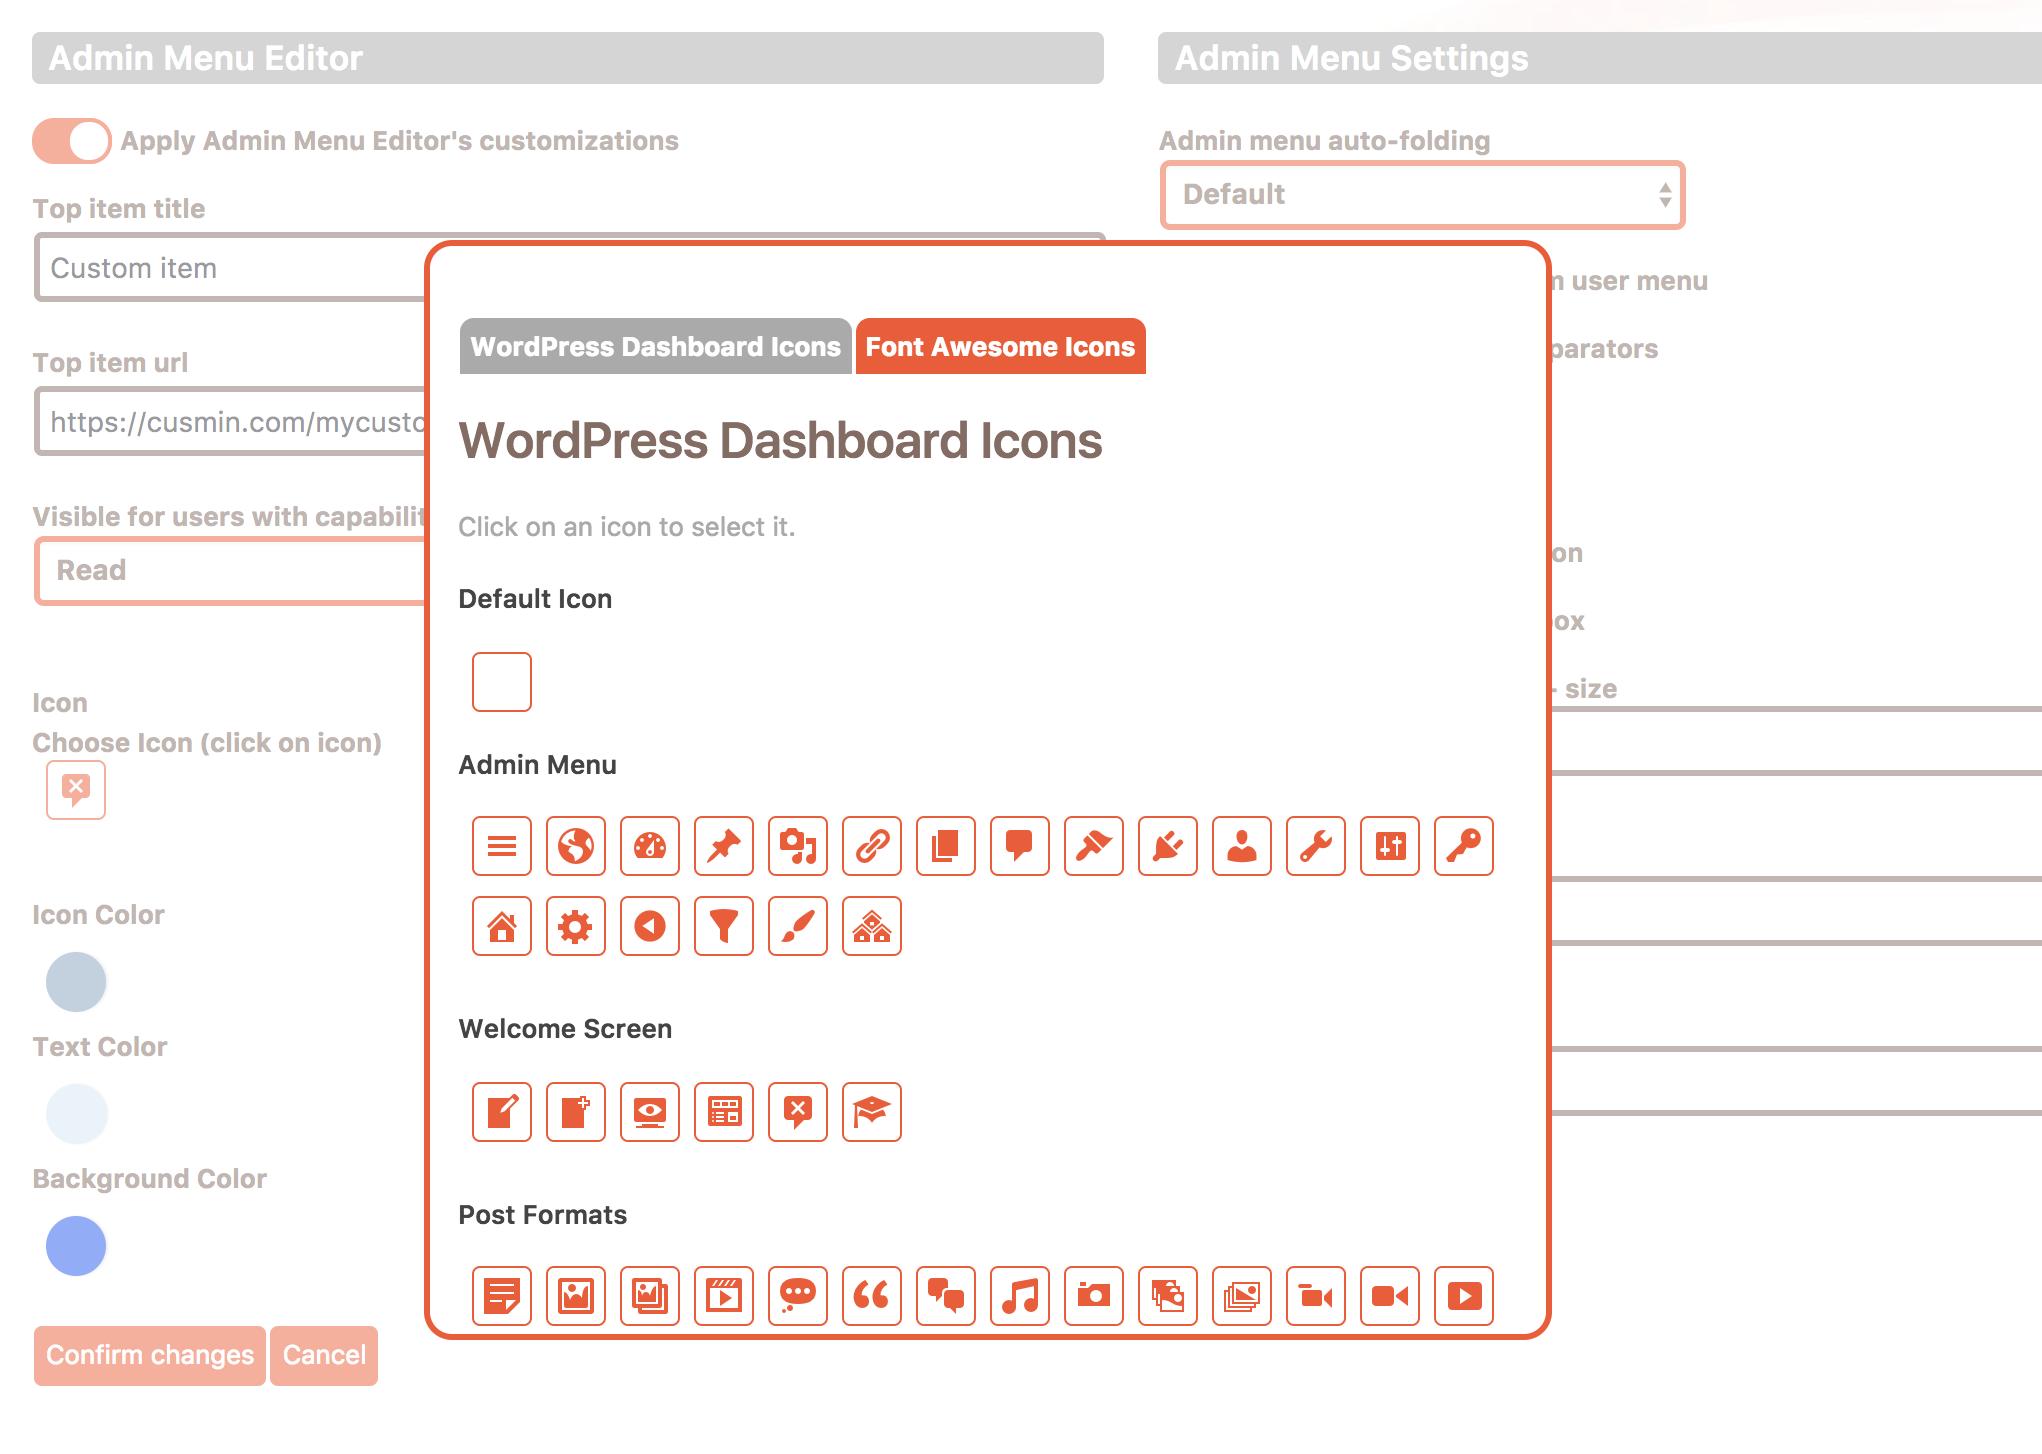 Icon picker popup window in Cusmin menu editor